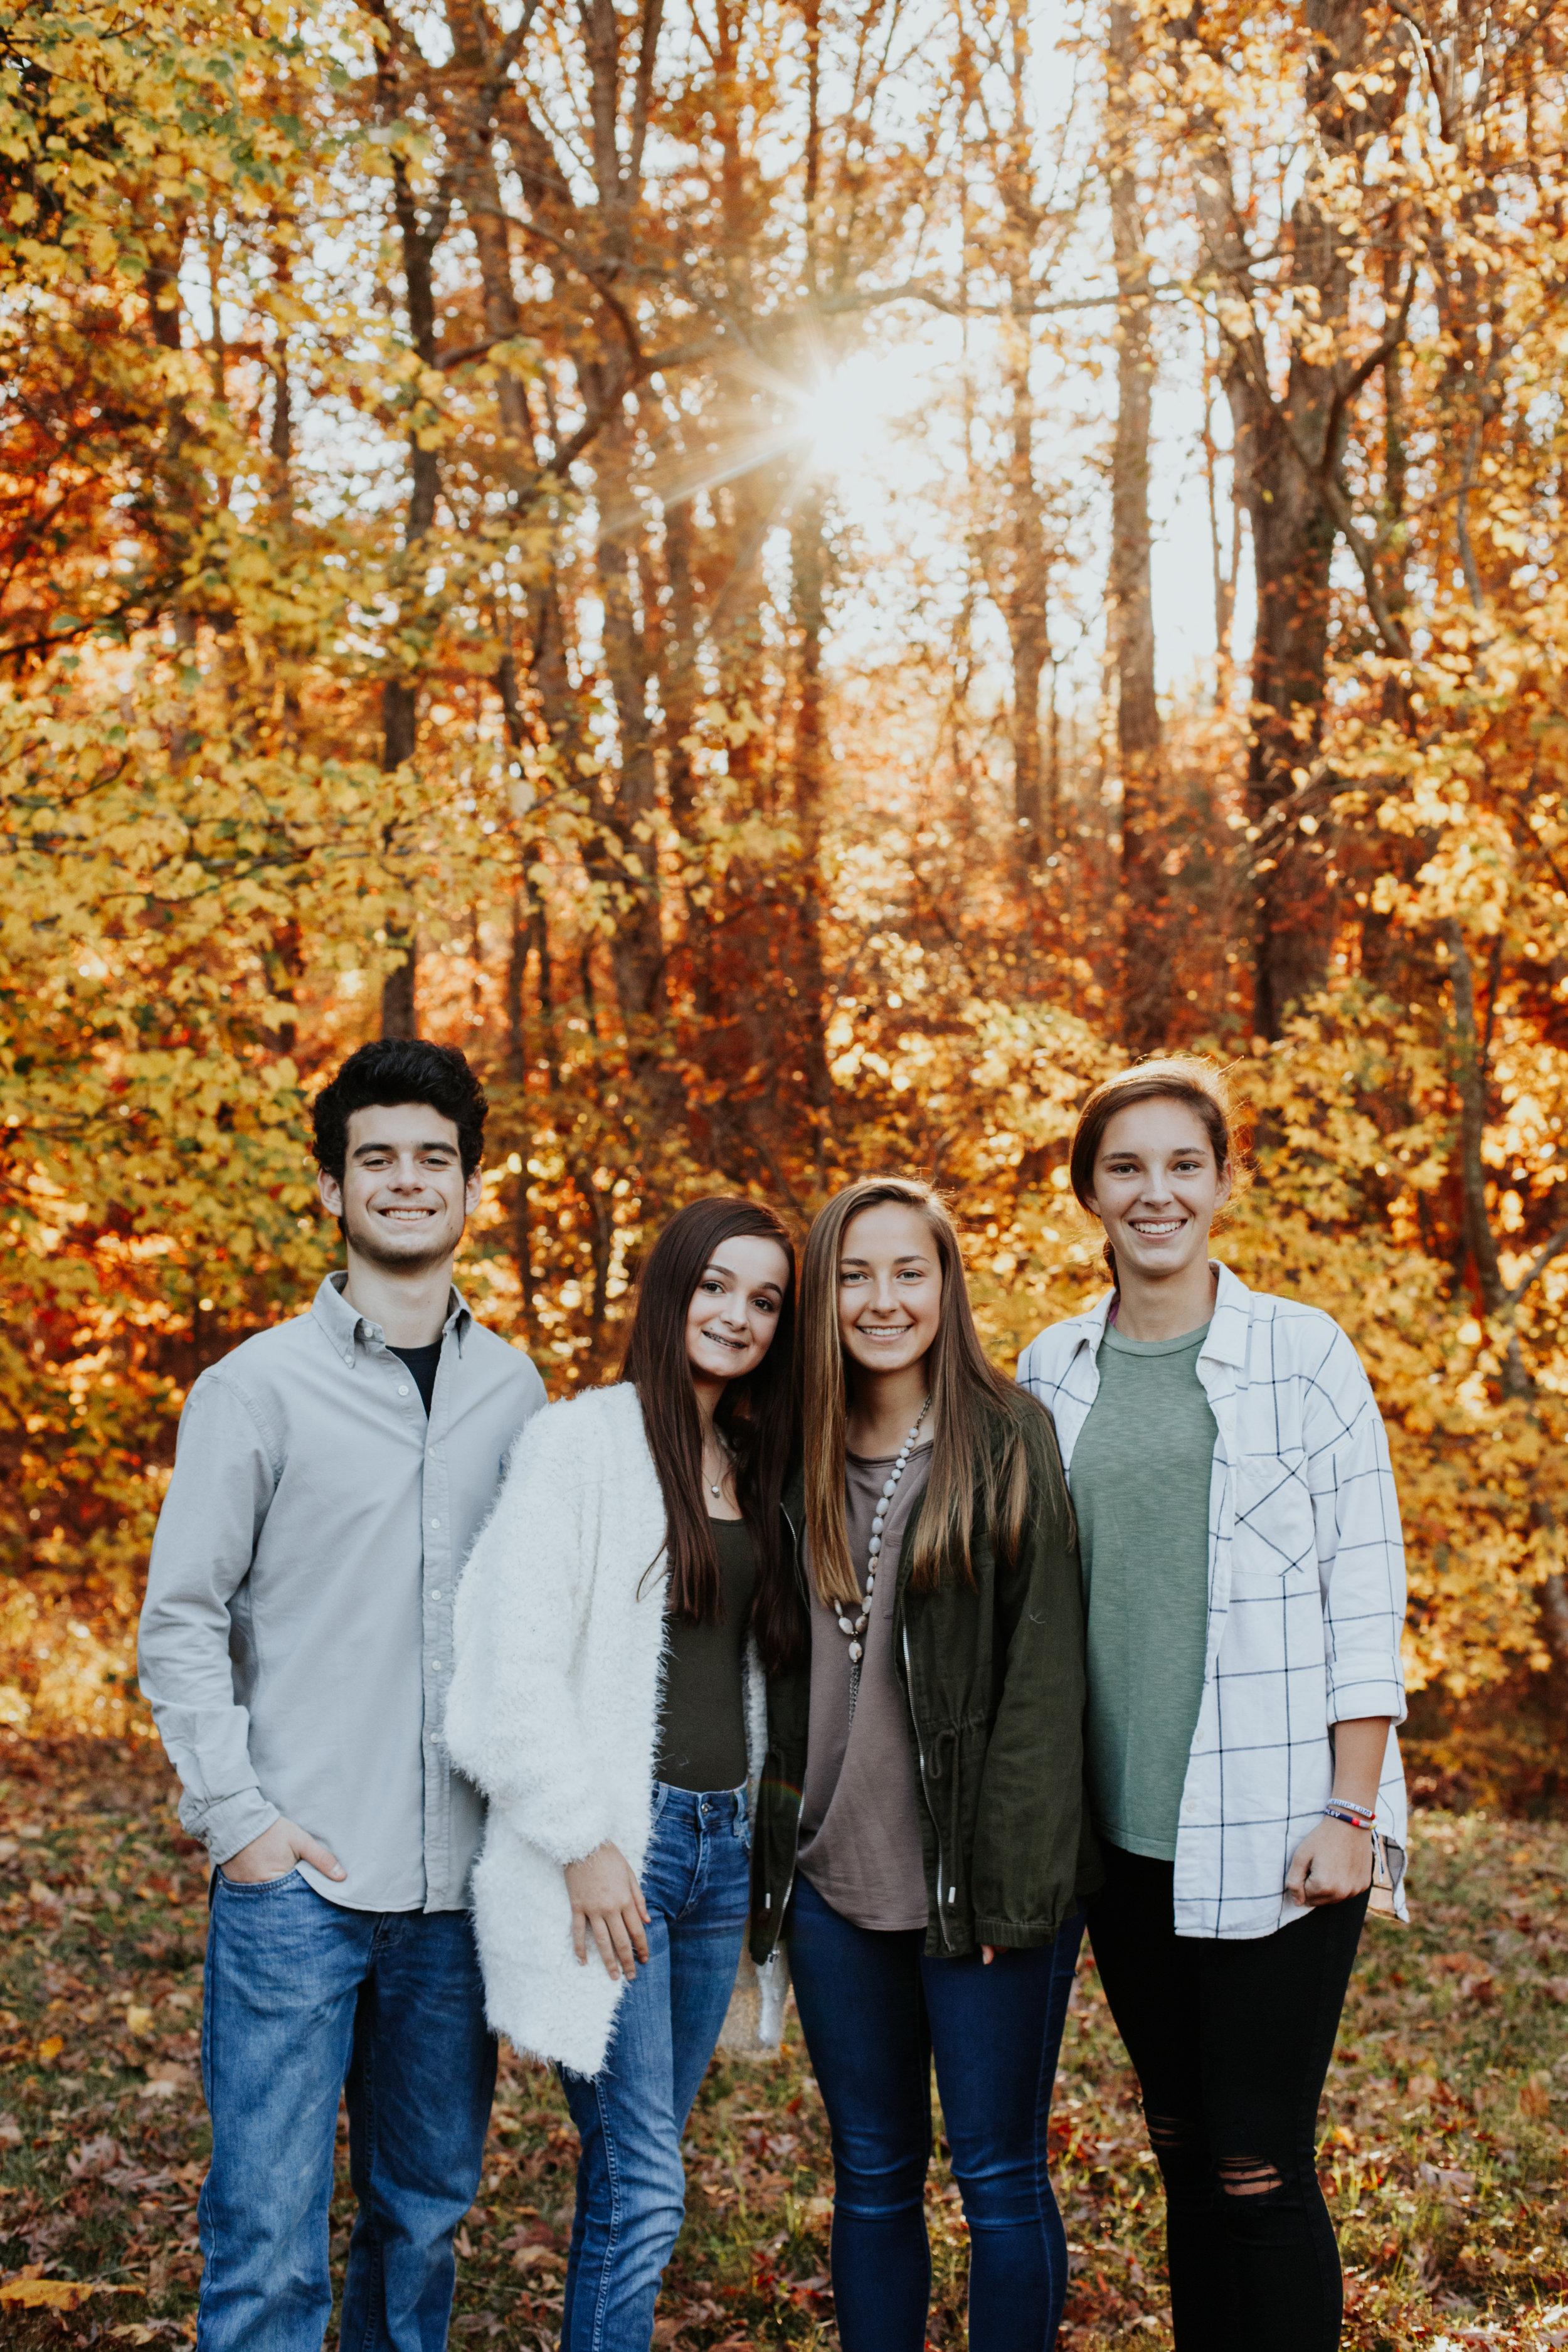 thedavisfamily-25.jpg